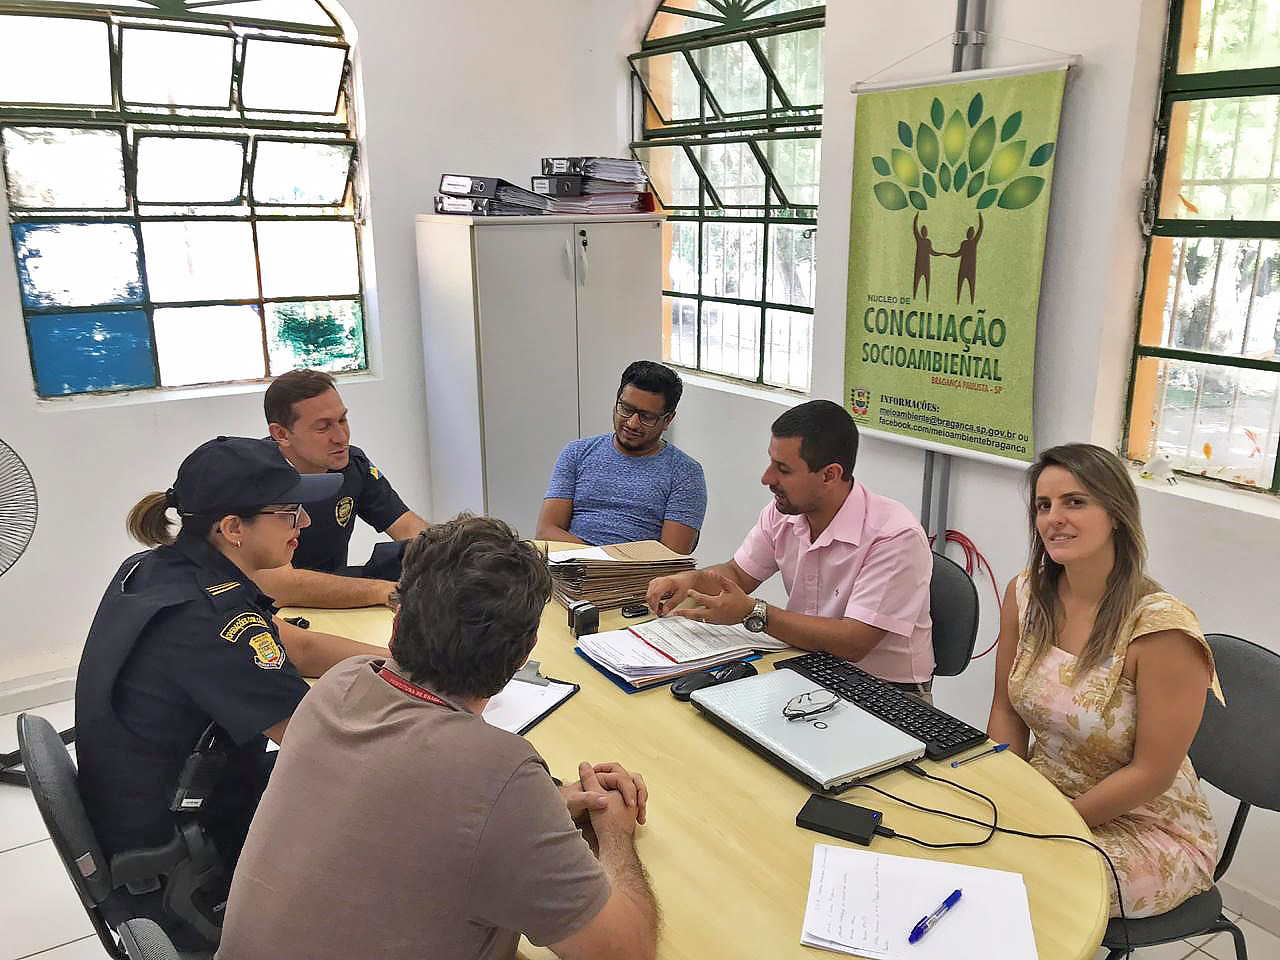 02.04.2019 Guarda Civil Municipal Ambiental 2